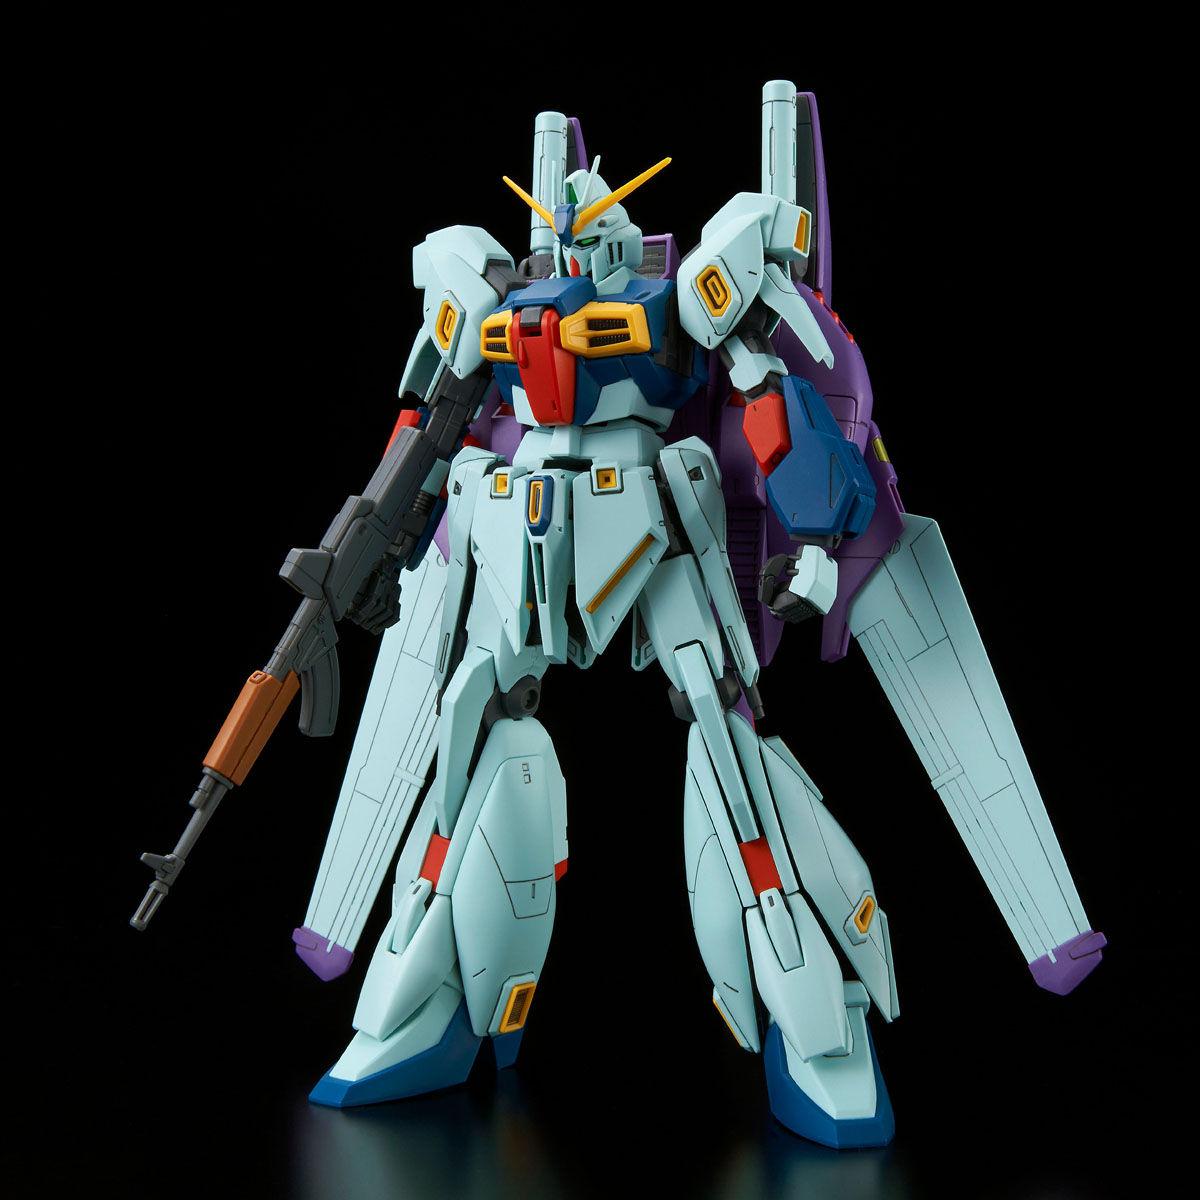 MG-re-gz-custom2.jpg